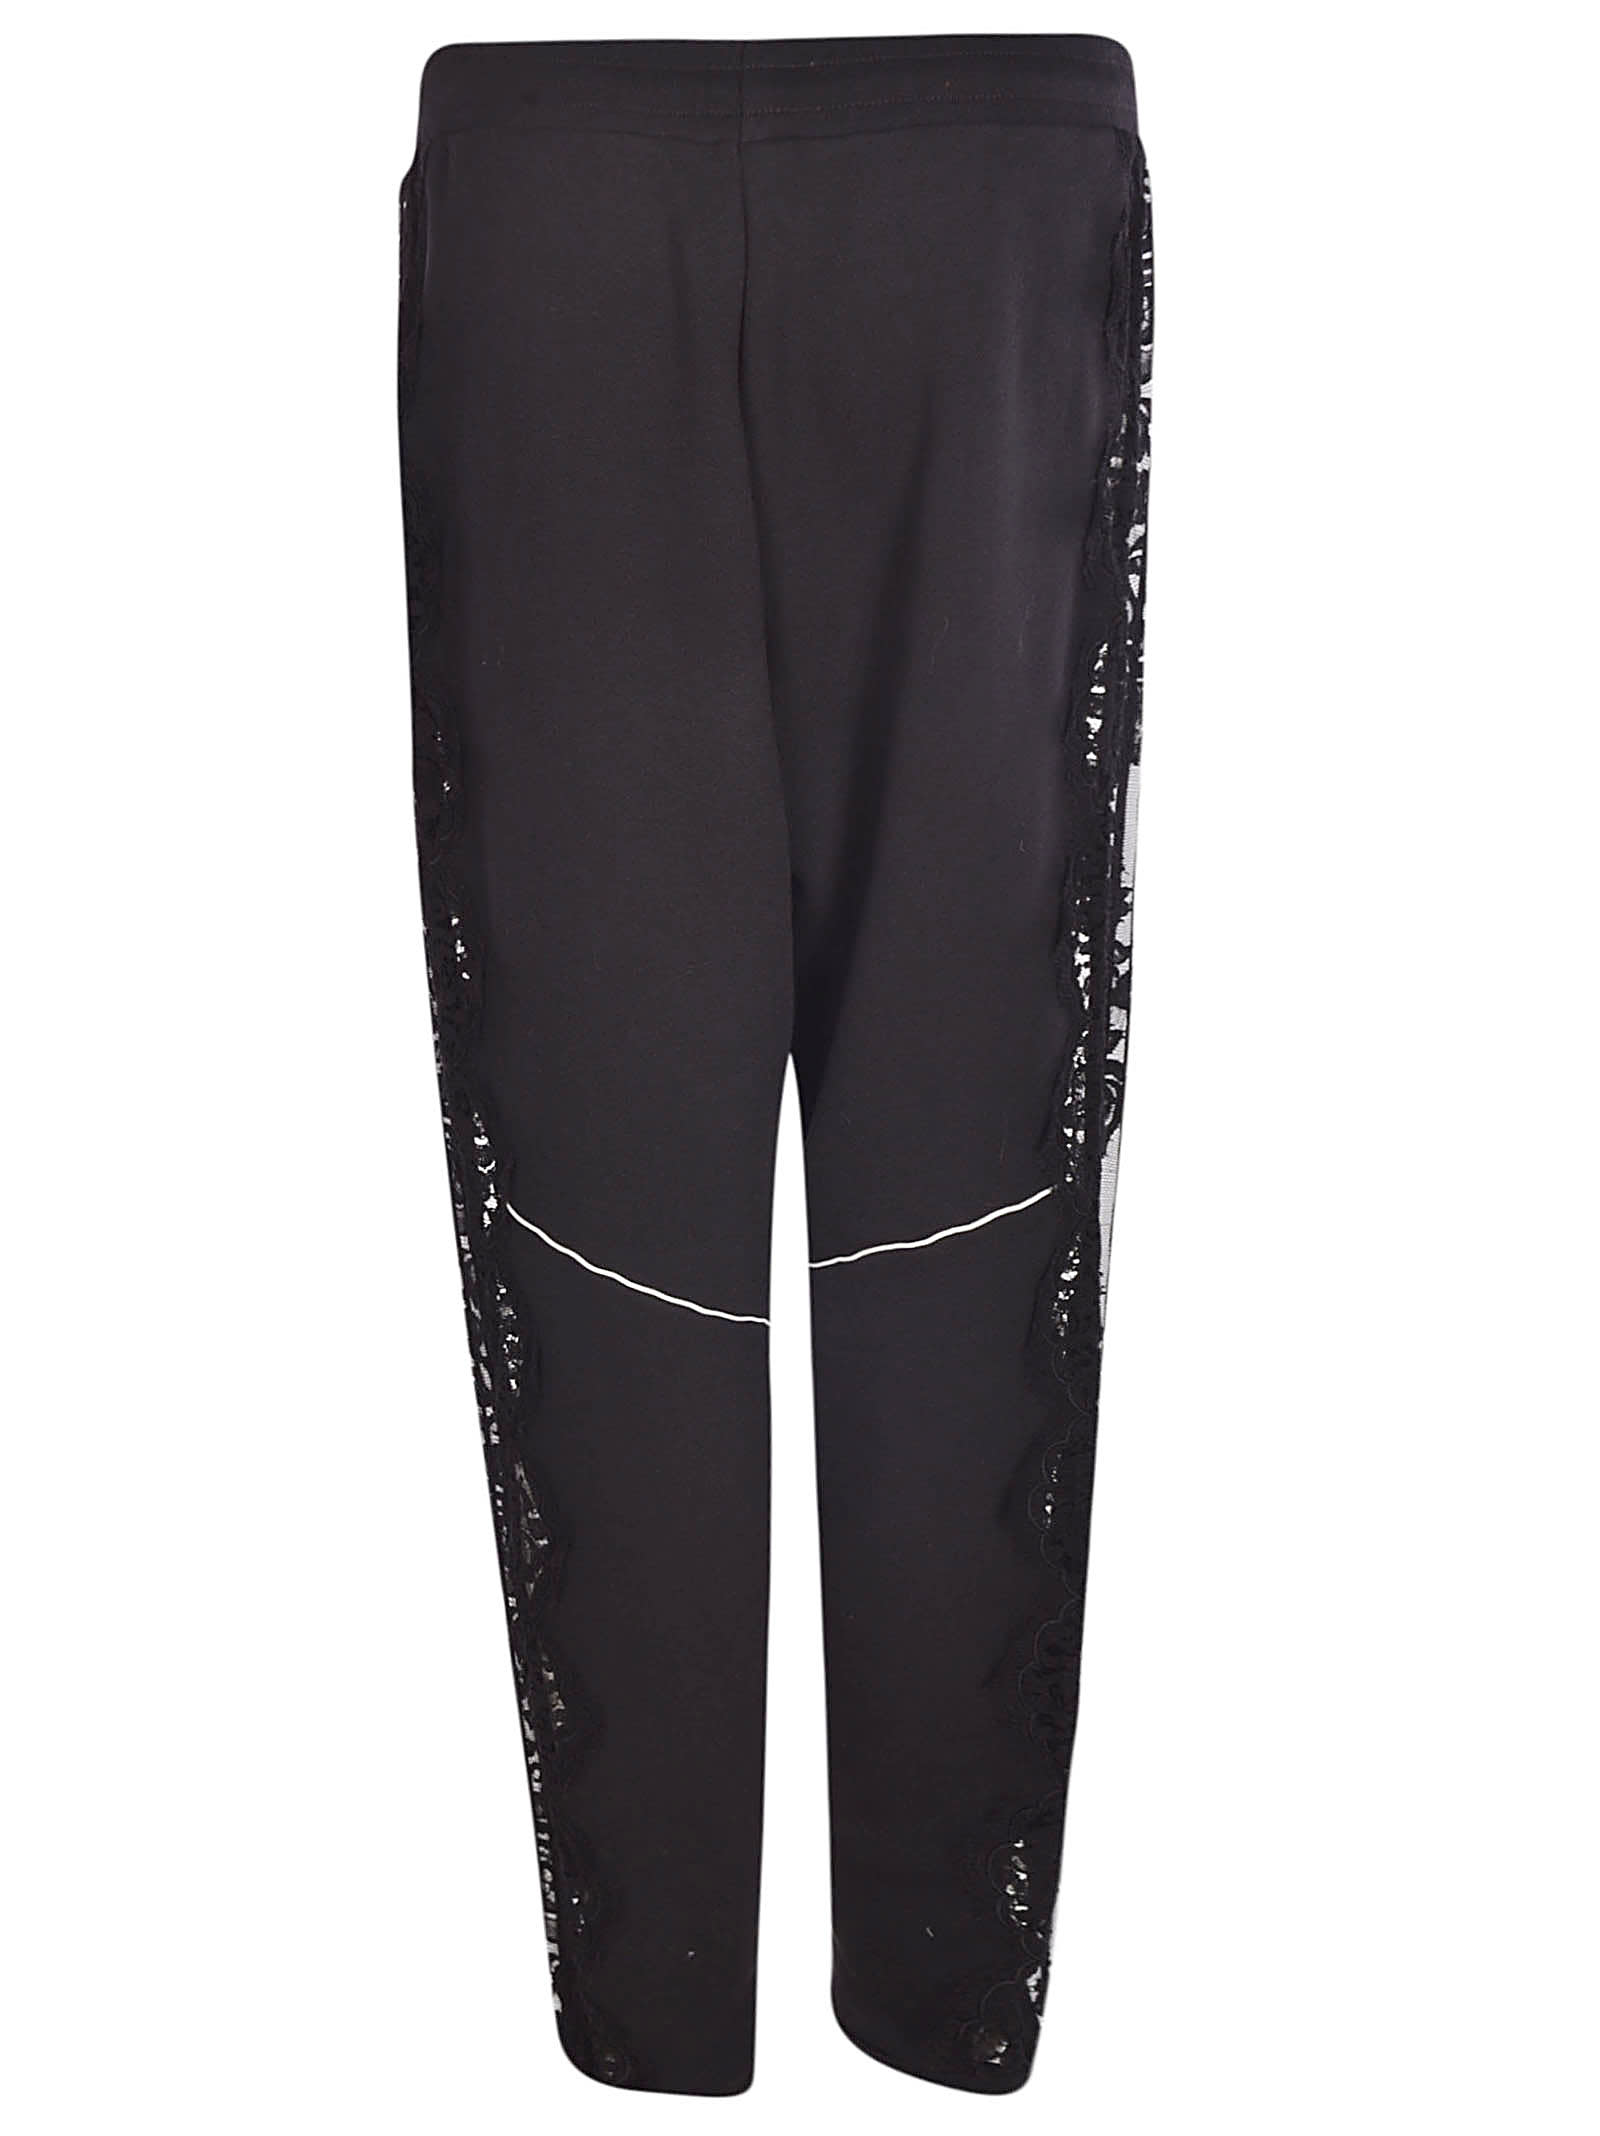 Adidas Adidas Loose Fit Track Pants white 11072150 | italist